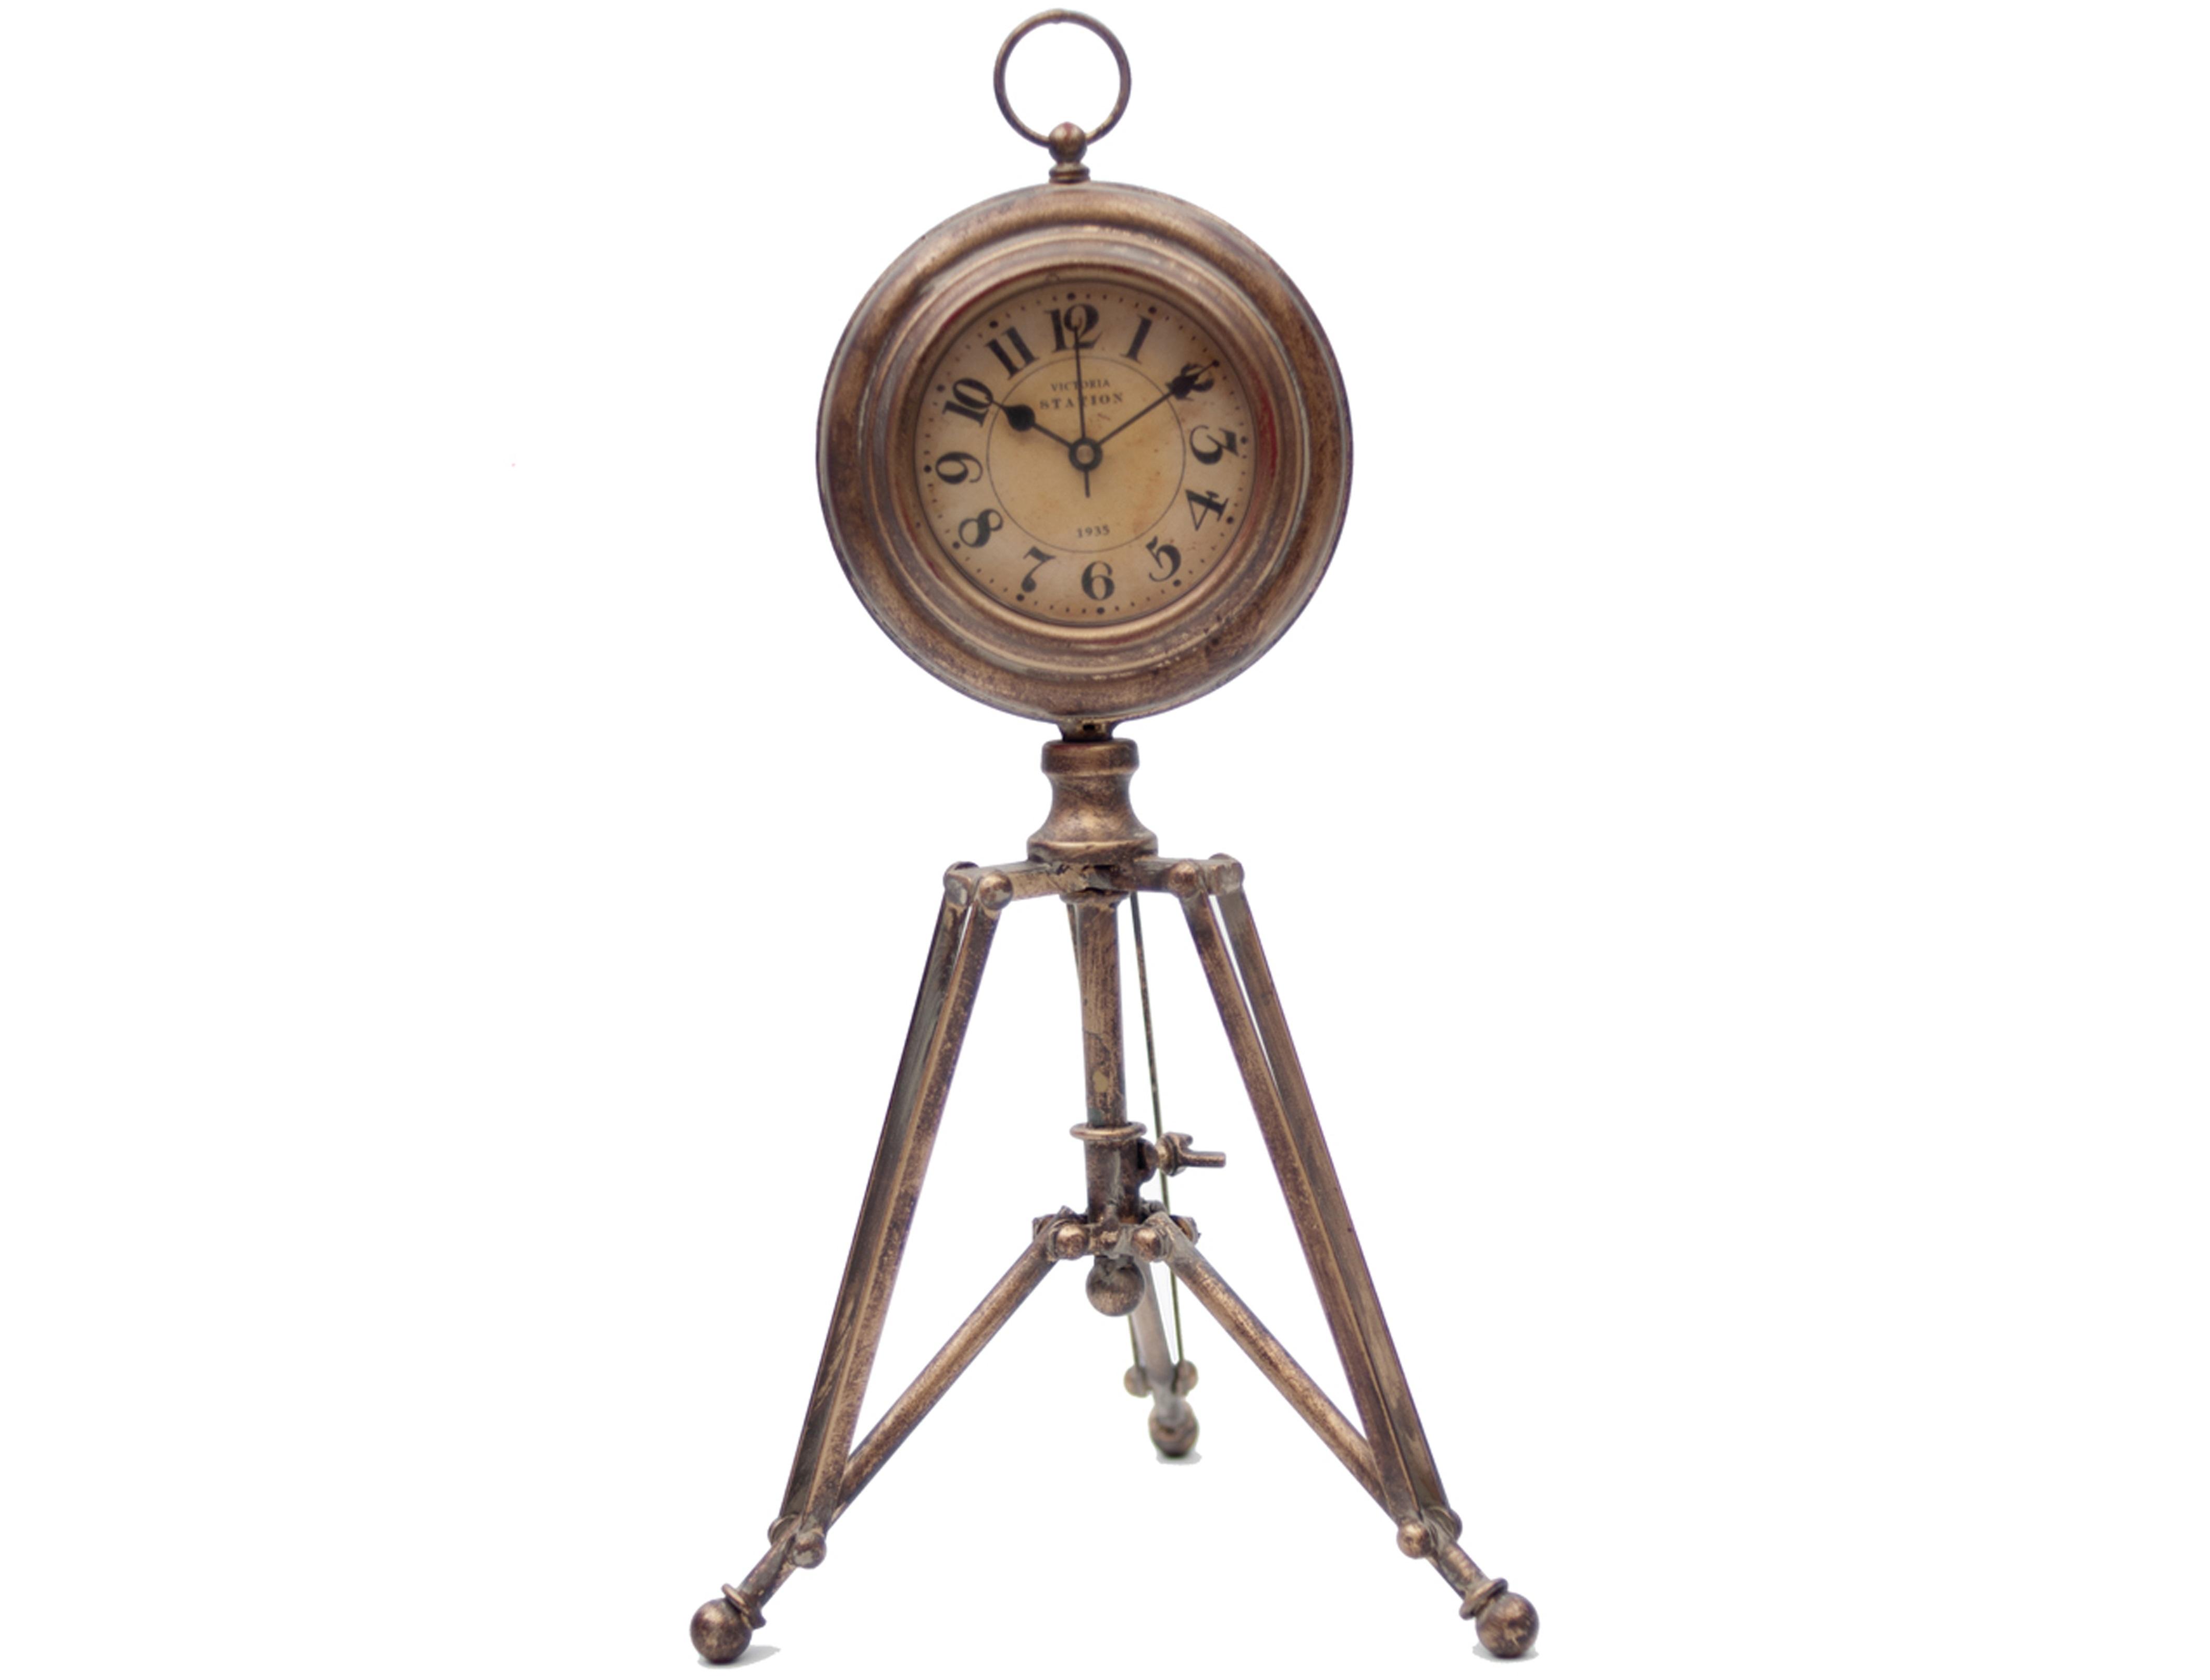 Часы Victoria StationНастольные часы<br>Батарейки типа AА.<br><br>Material: Железо<br>Length см: None<br>Width см: None<br>Height см: 37<br>Diameter см: 22